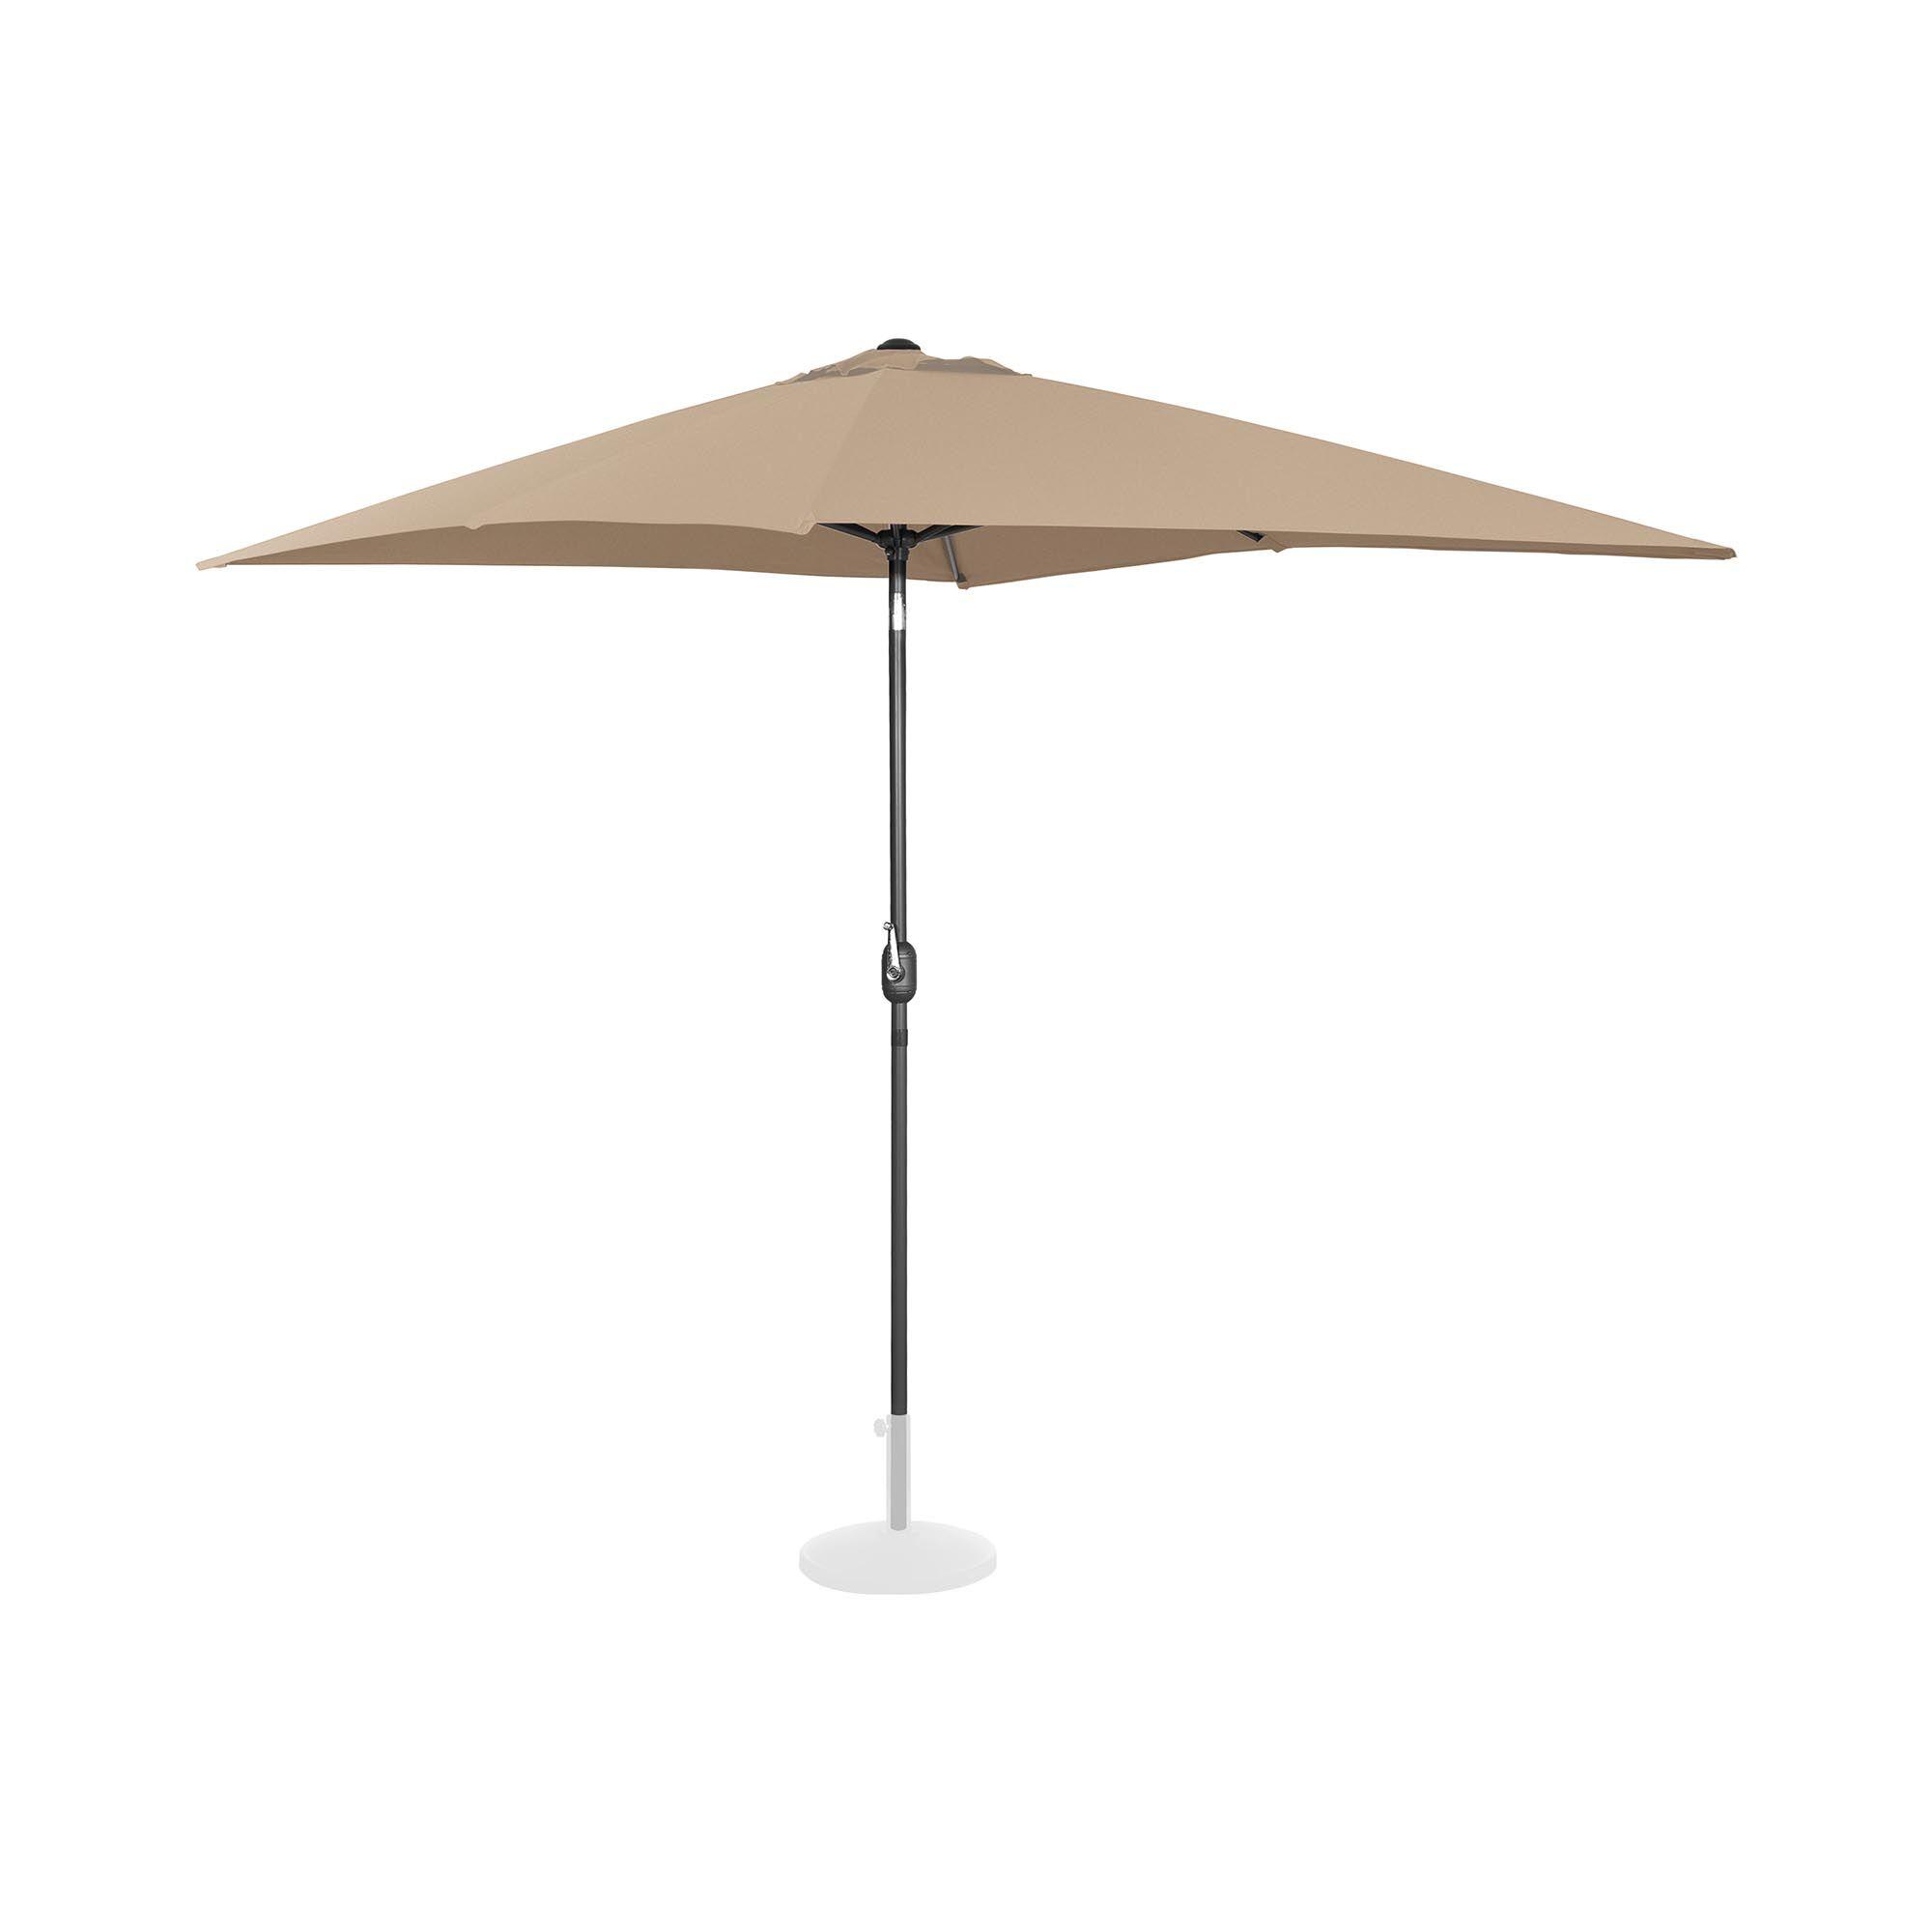 Uniprodo Parasol - taupe - rektangulær - 200 x 300 cm - knæk-position UNI_UMBRELLA_TSQ2030TA